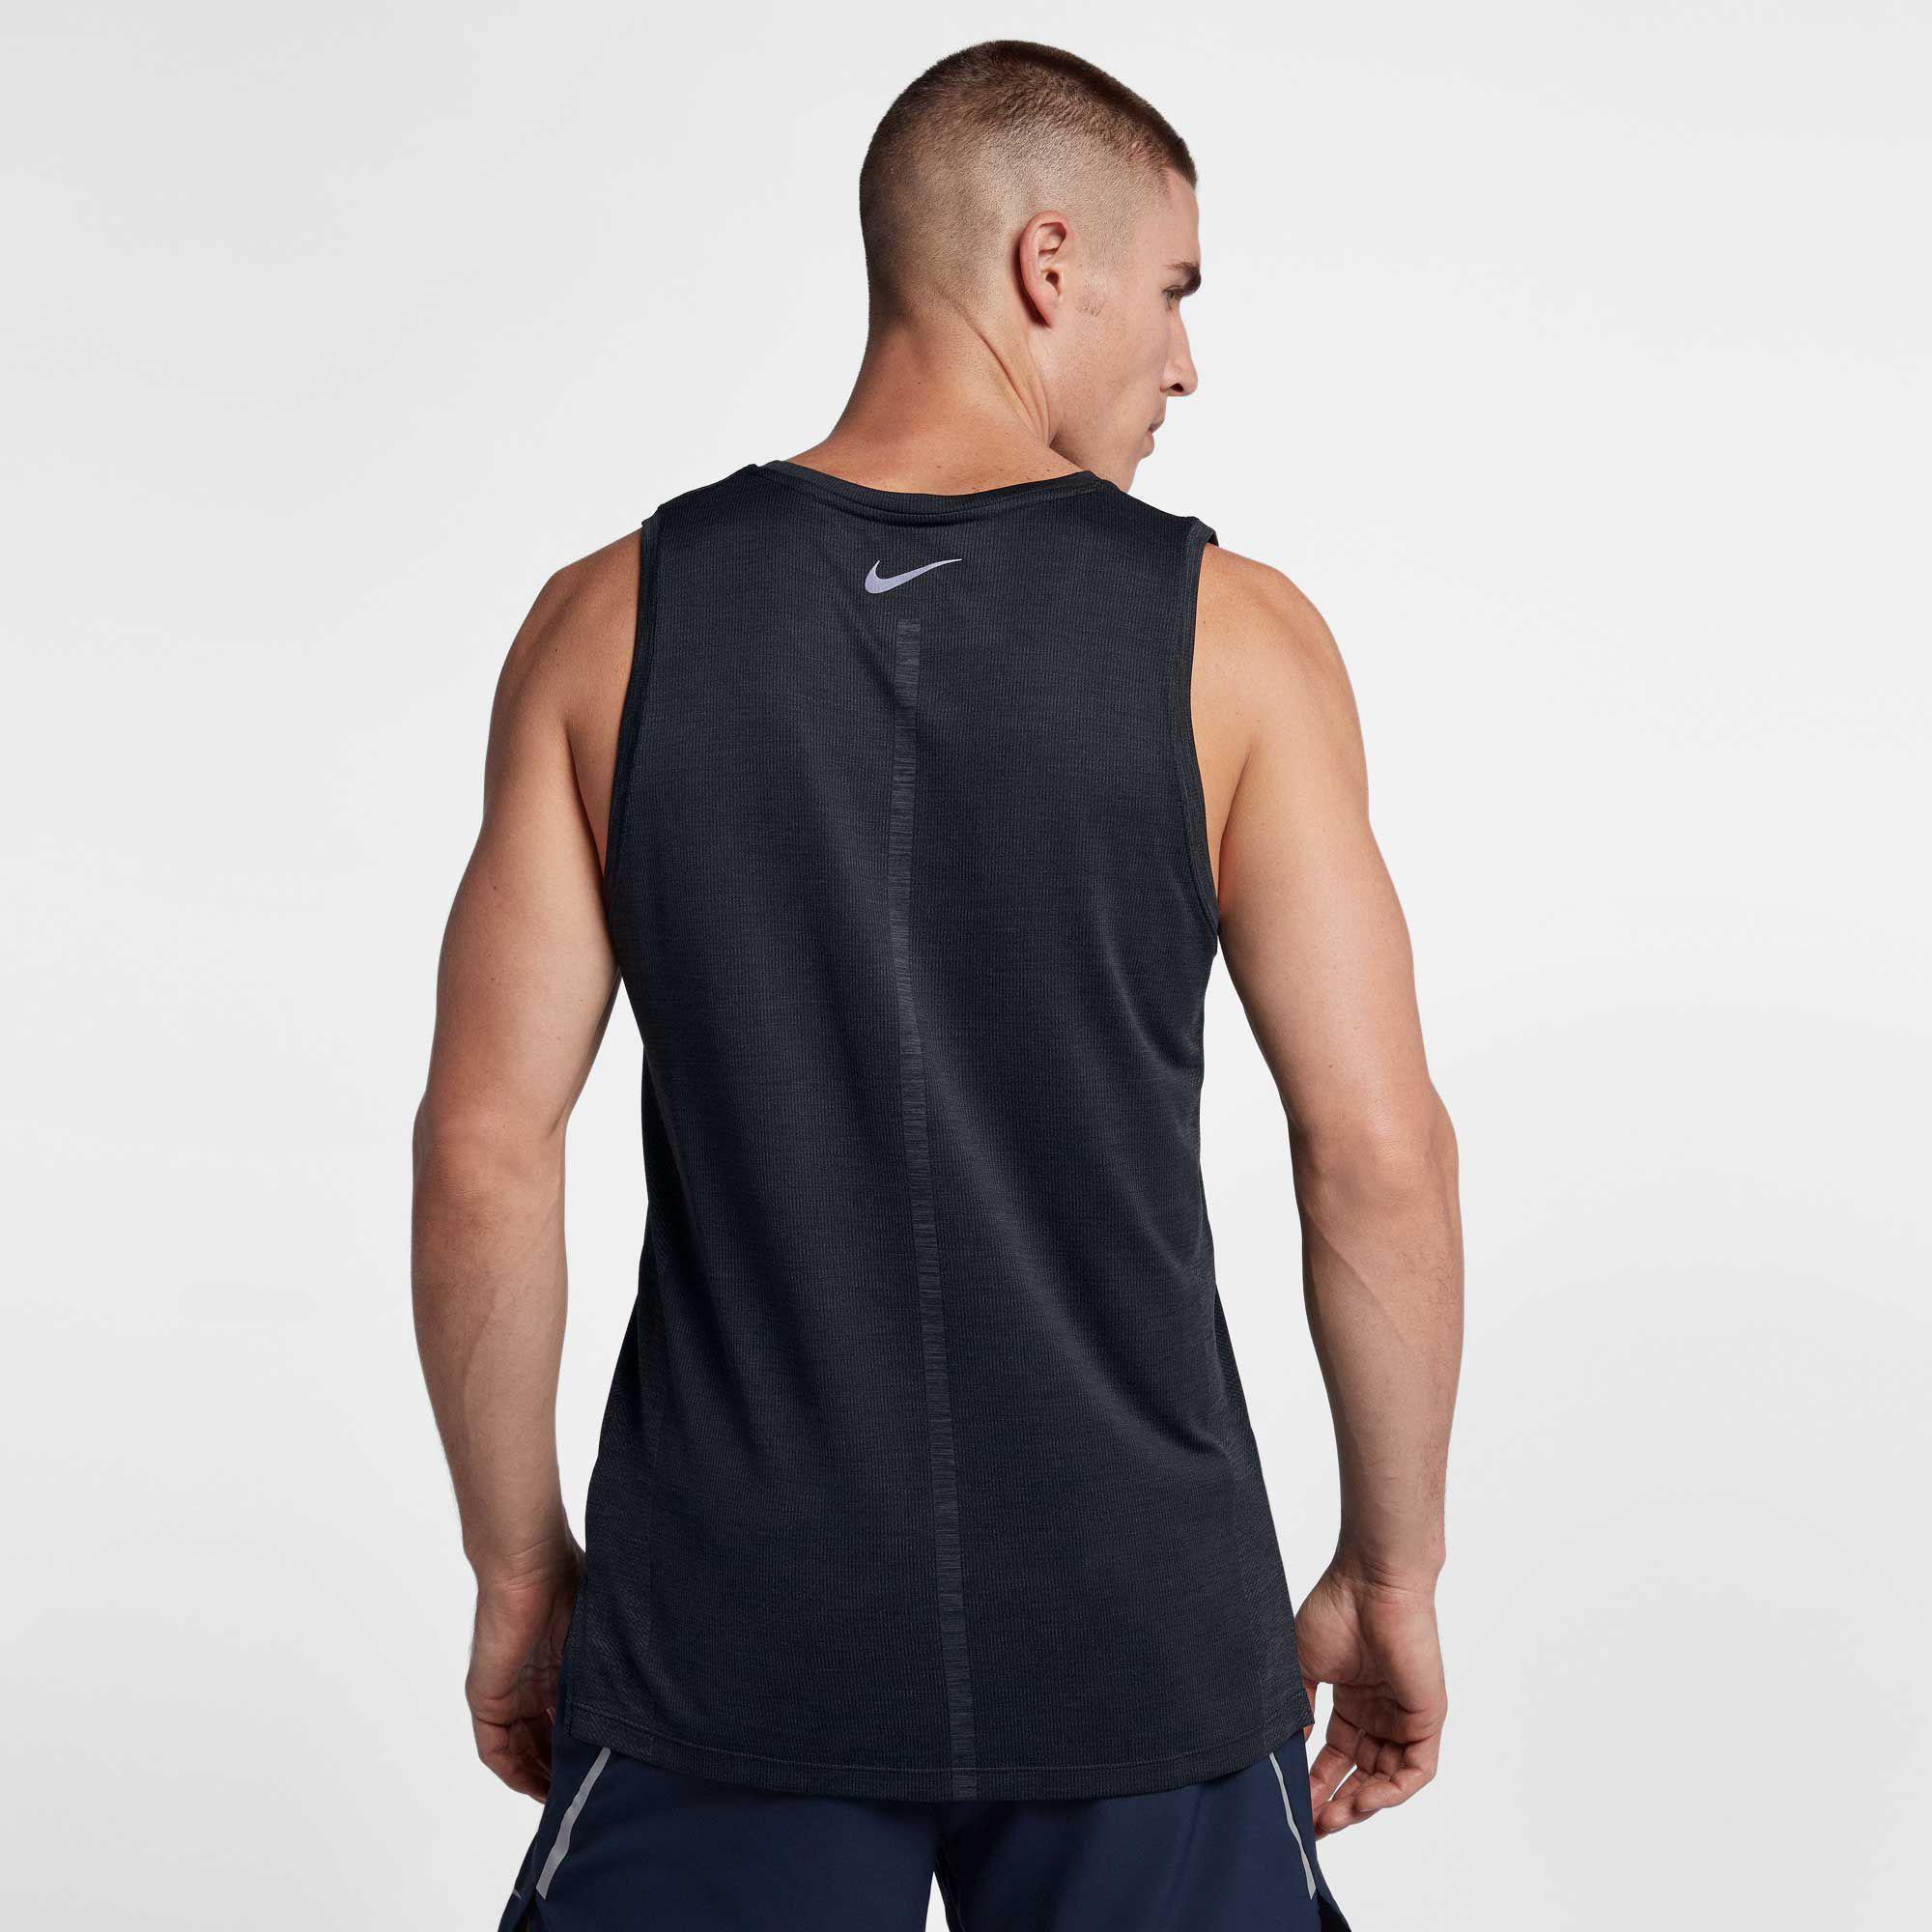 df370599905a71 Nike - Black Dri-fit Medalist Men s Running Tank for Men - Lyst. View  fullscreen